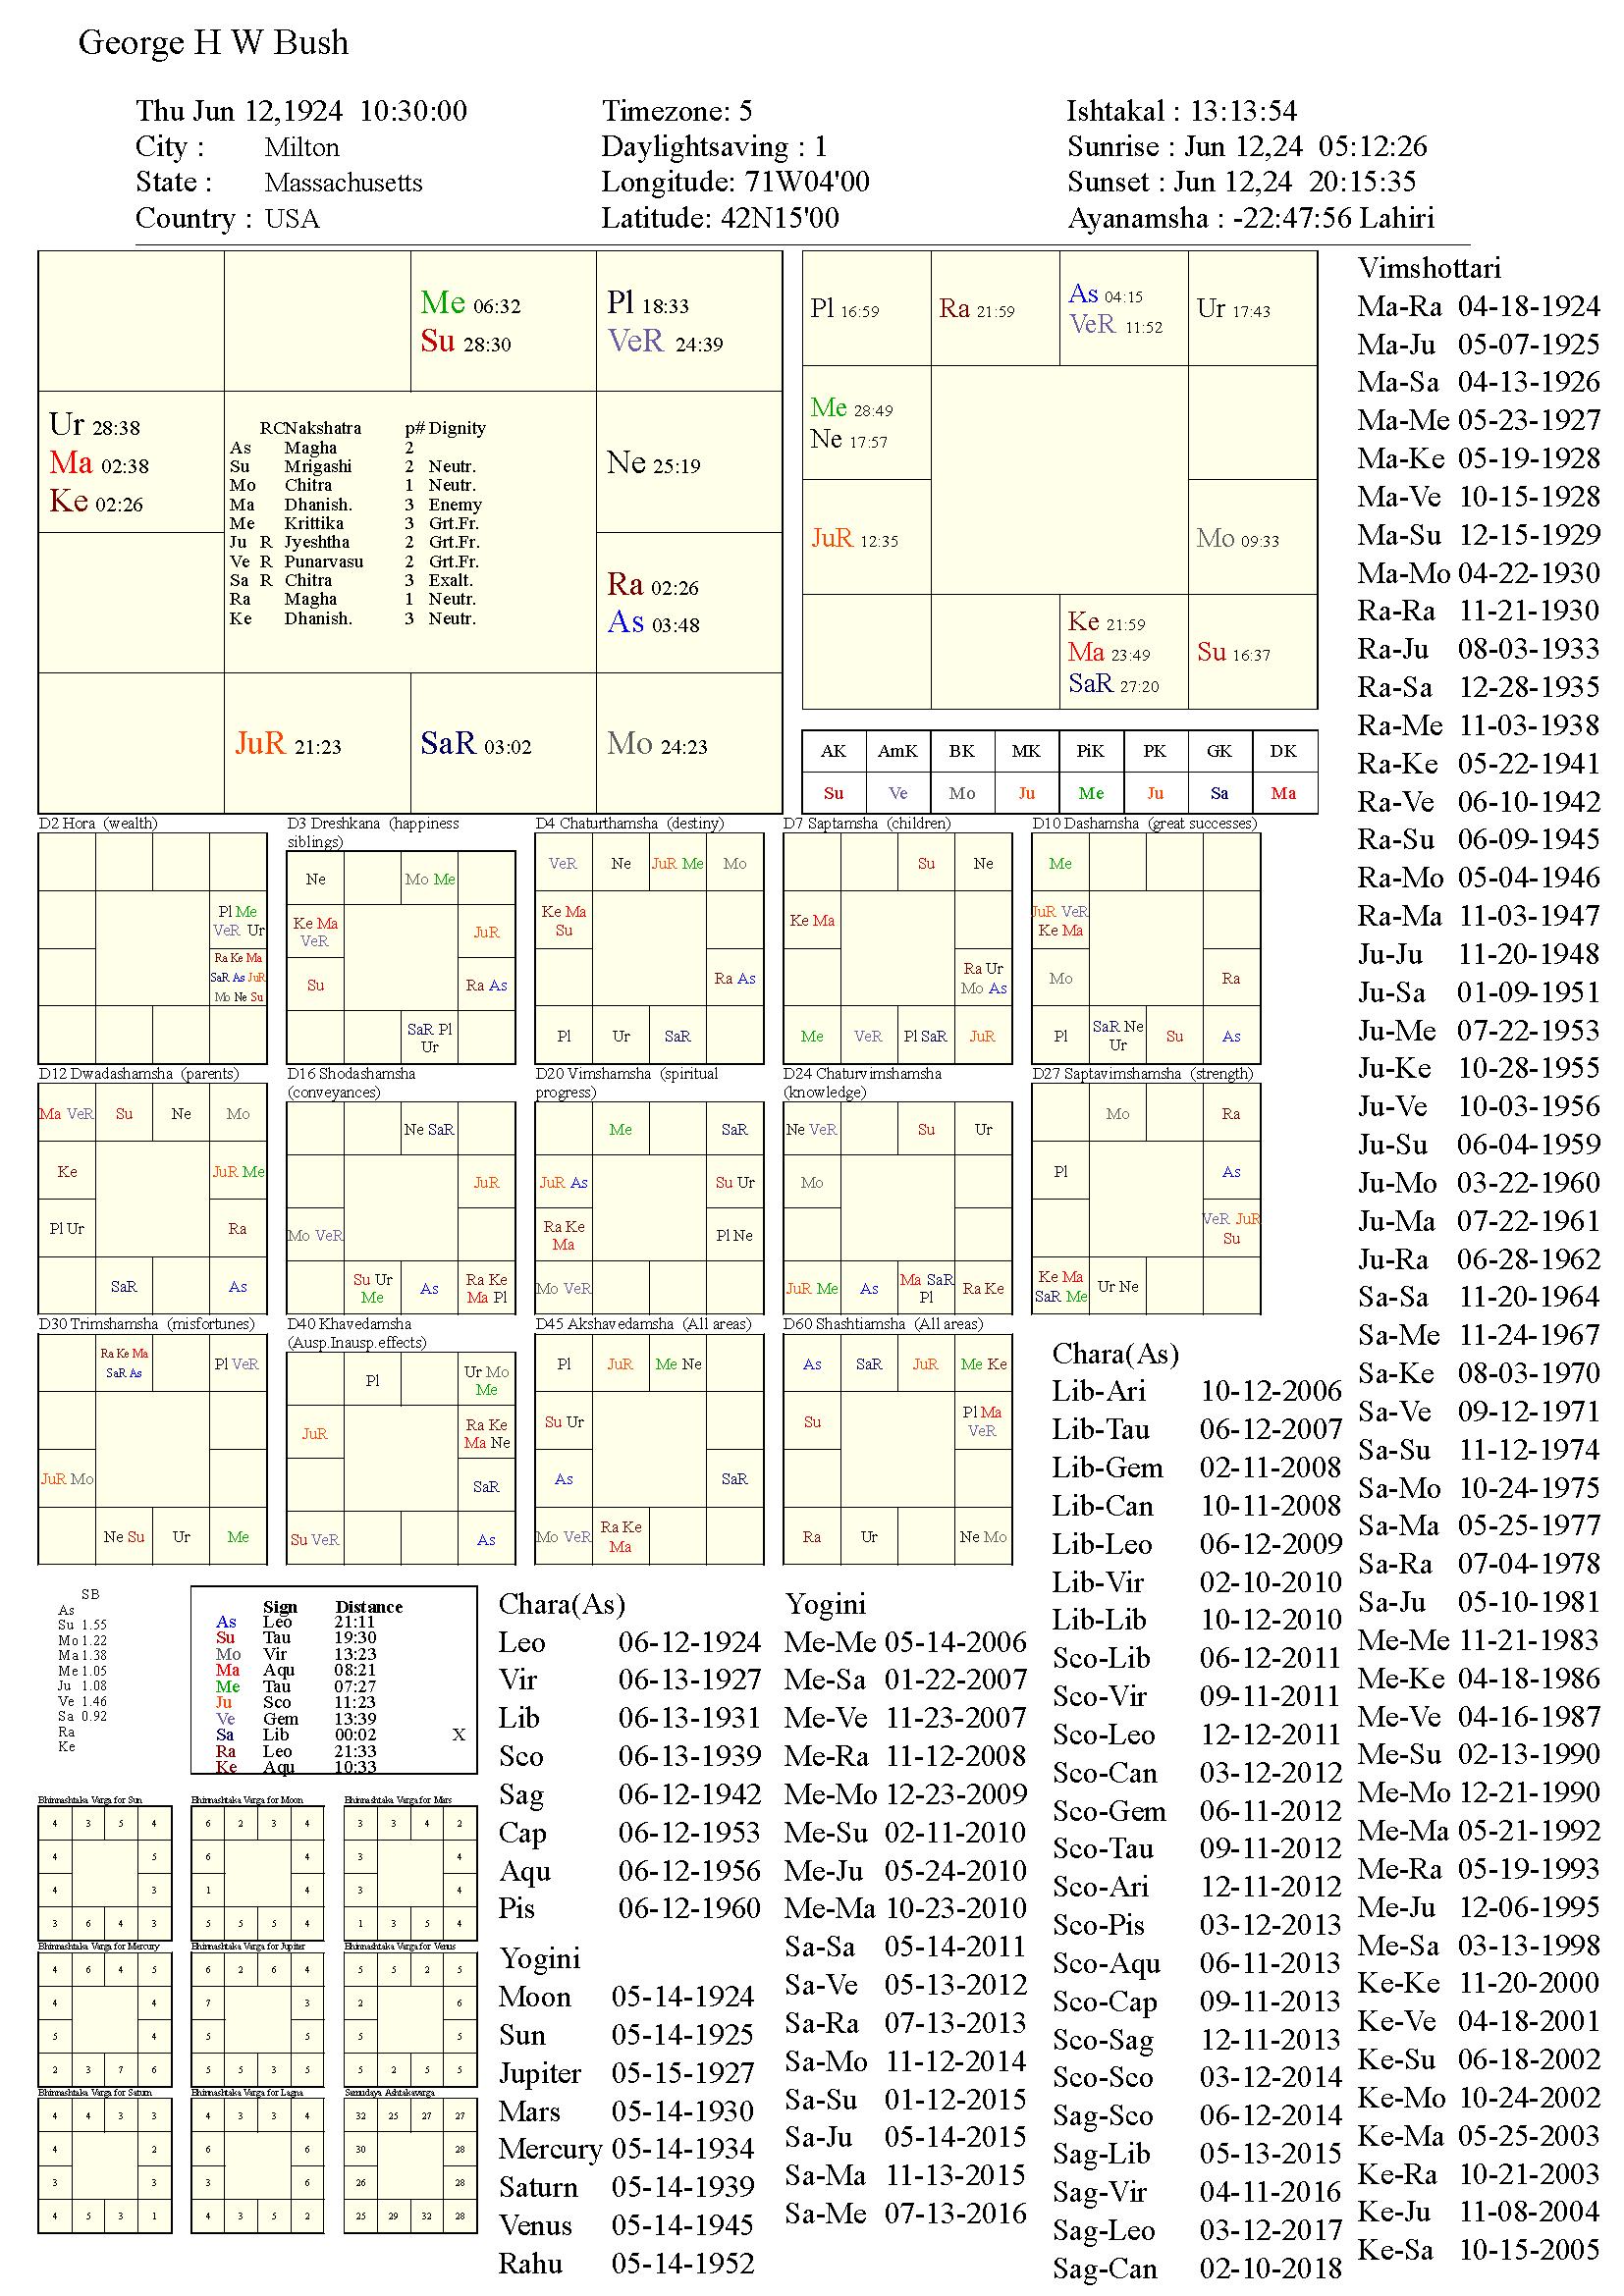 georgehwbush_chart